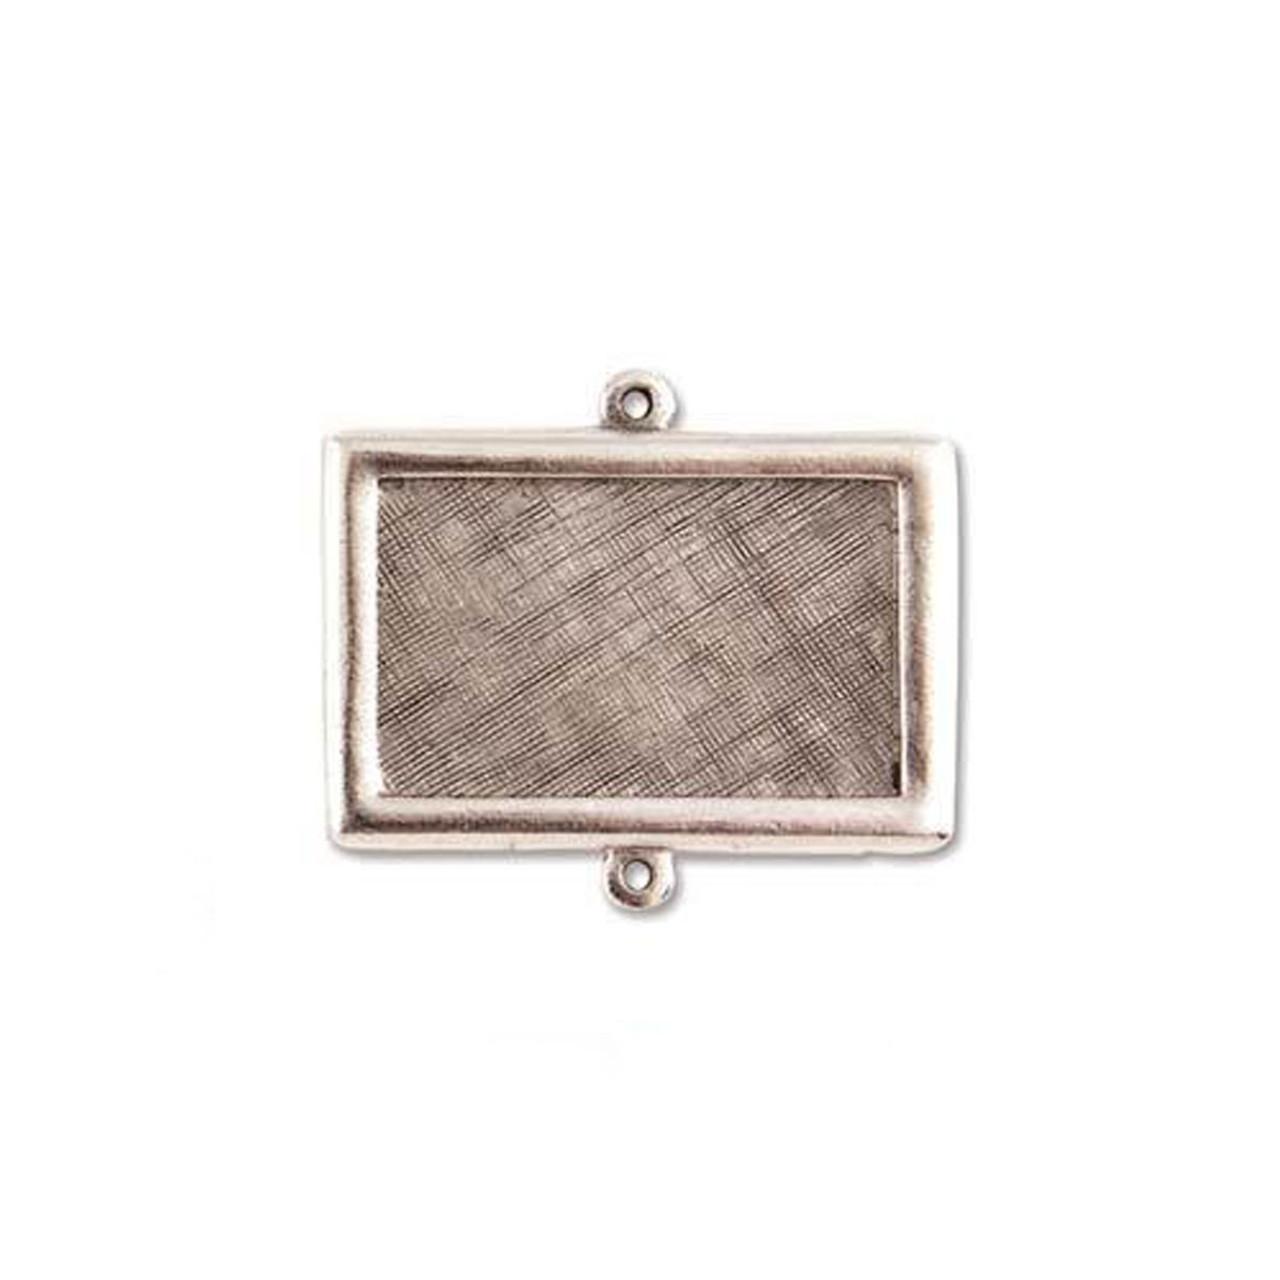 Rectangle Link Bezel - Antique Silver - 37 x 25mm